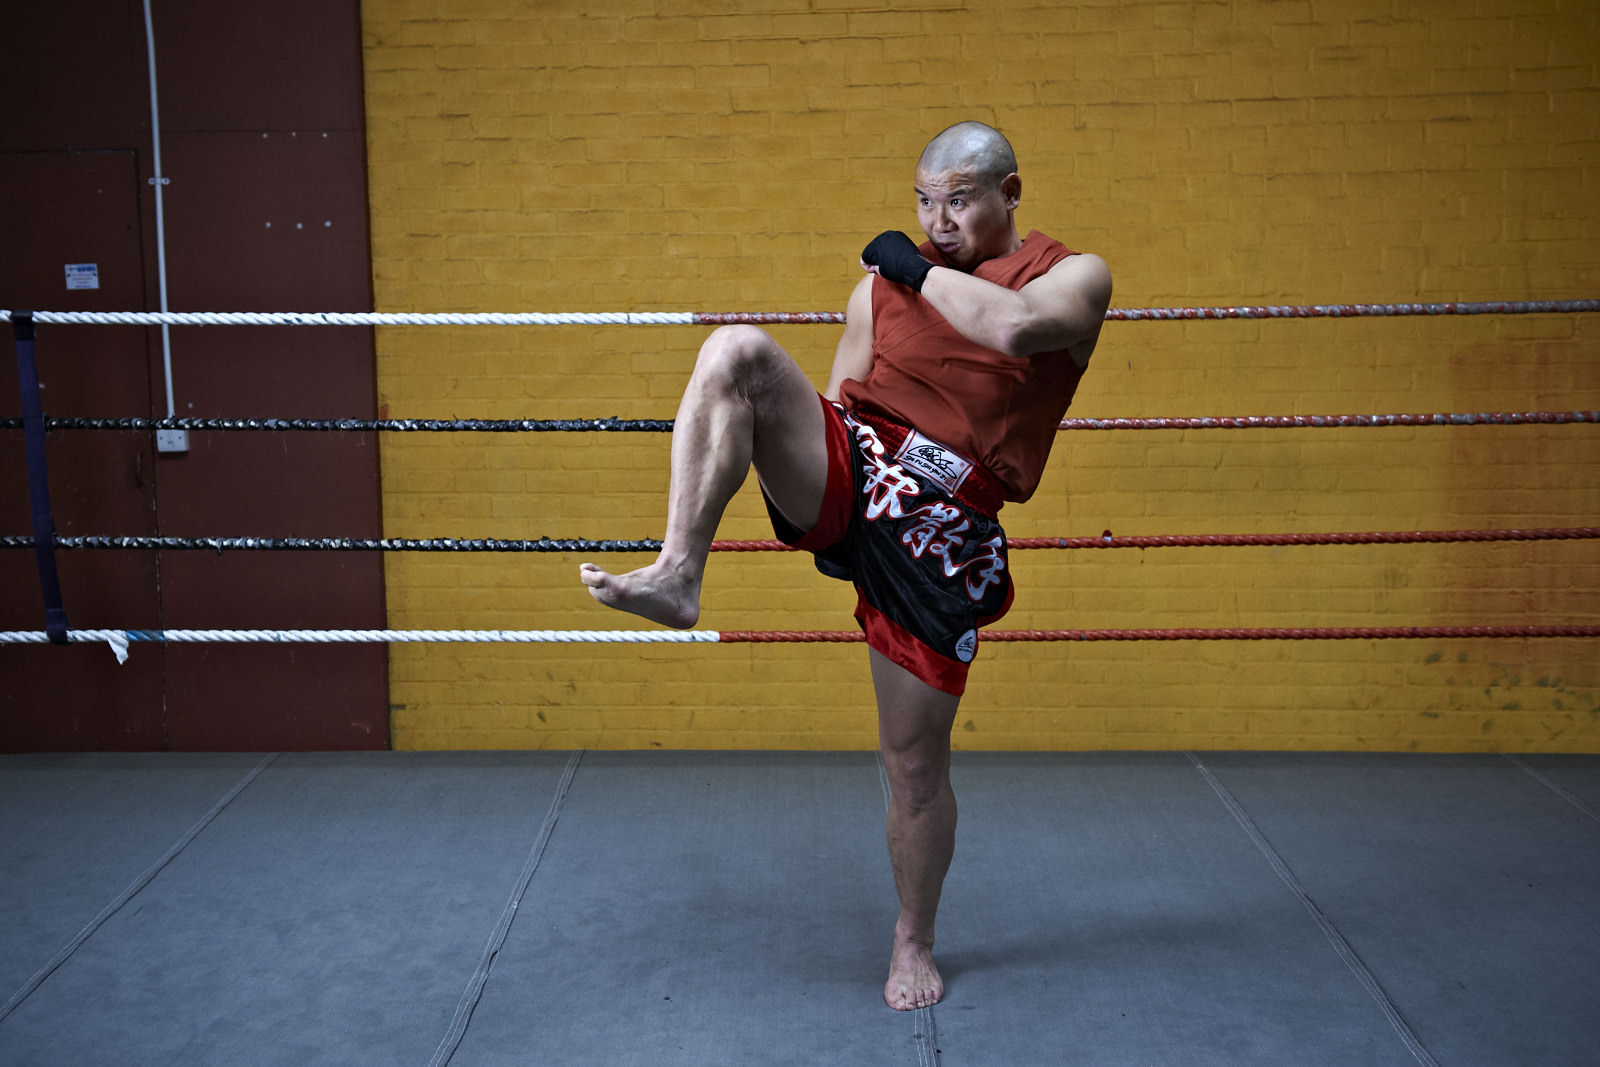 Shaolin temple uk shifu yanzi kick 5.jpg